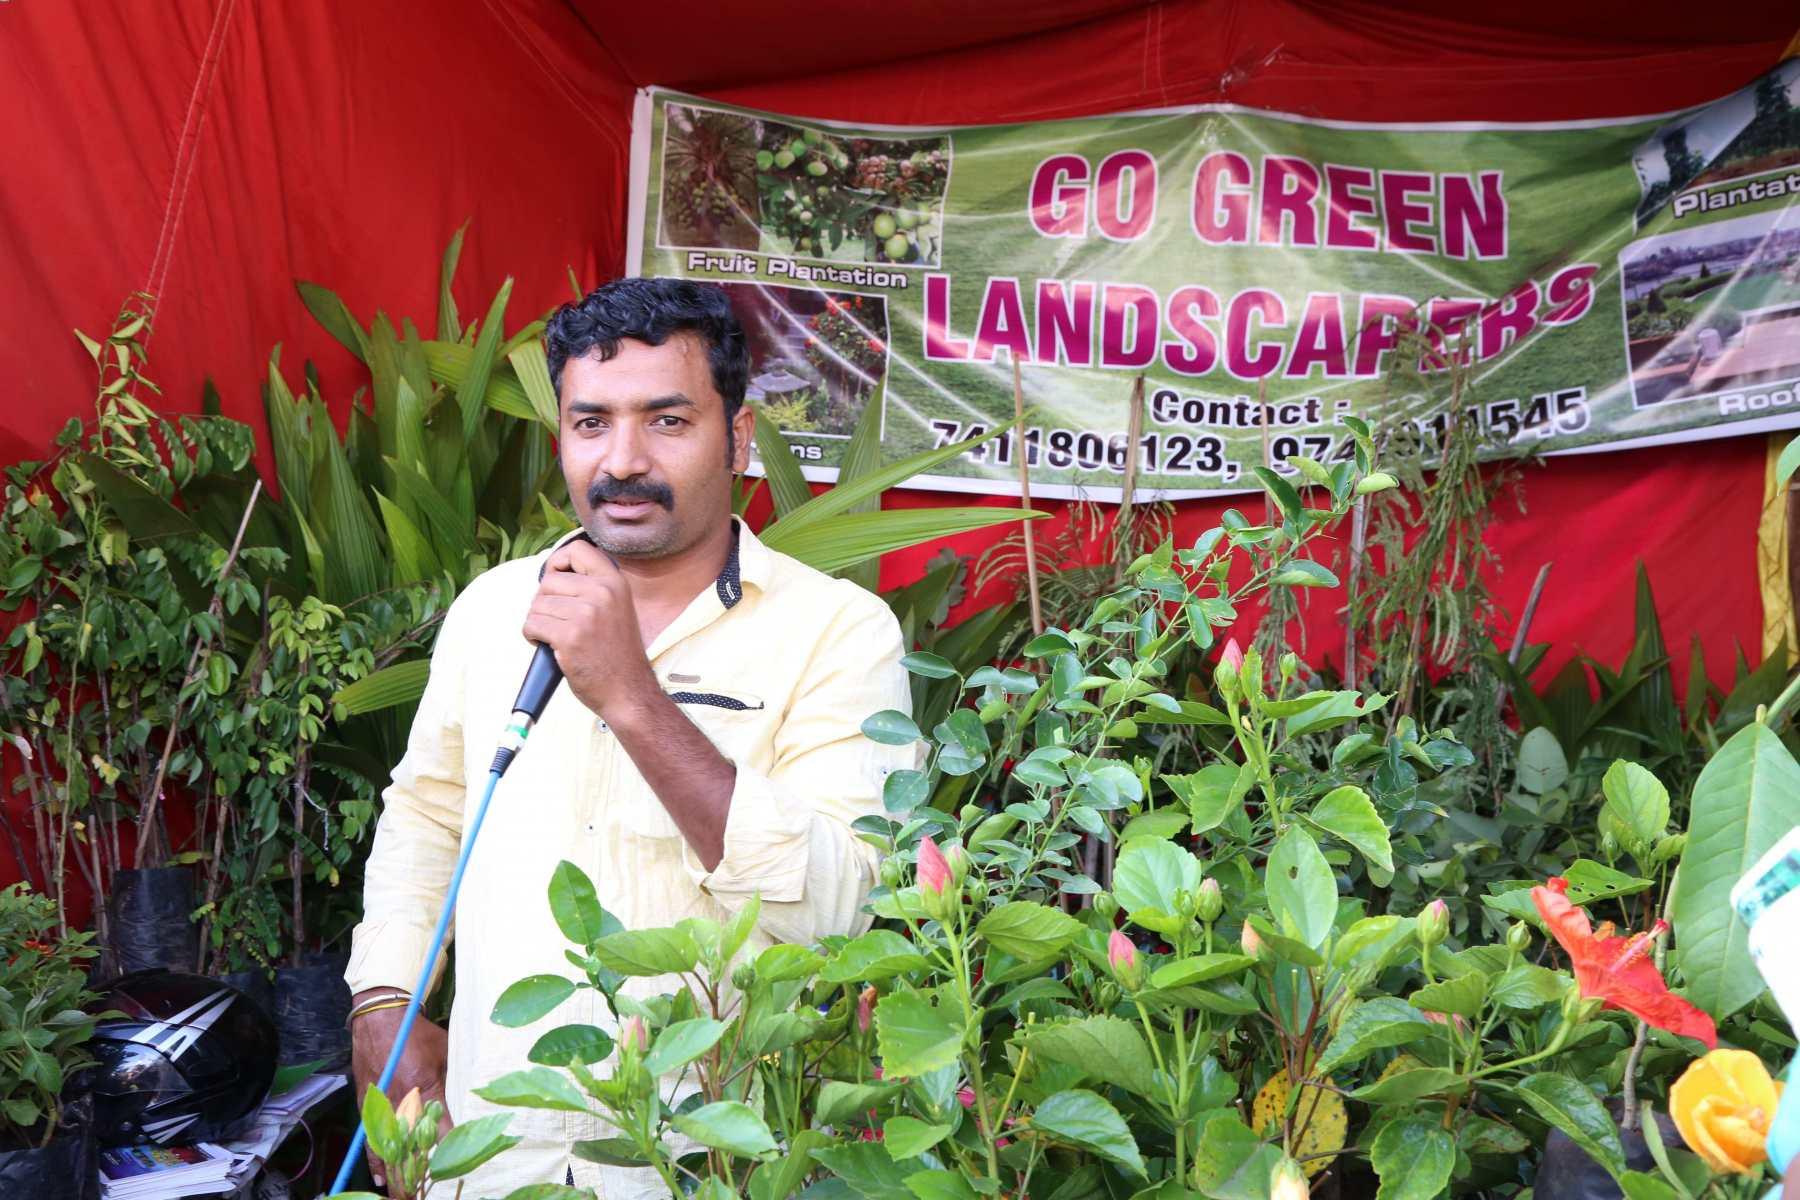 Farmer explaining landscaping process